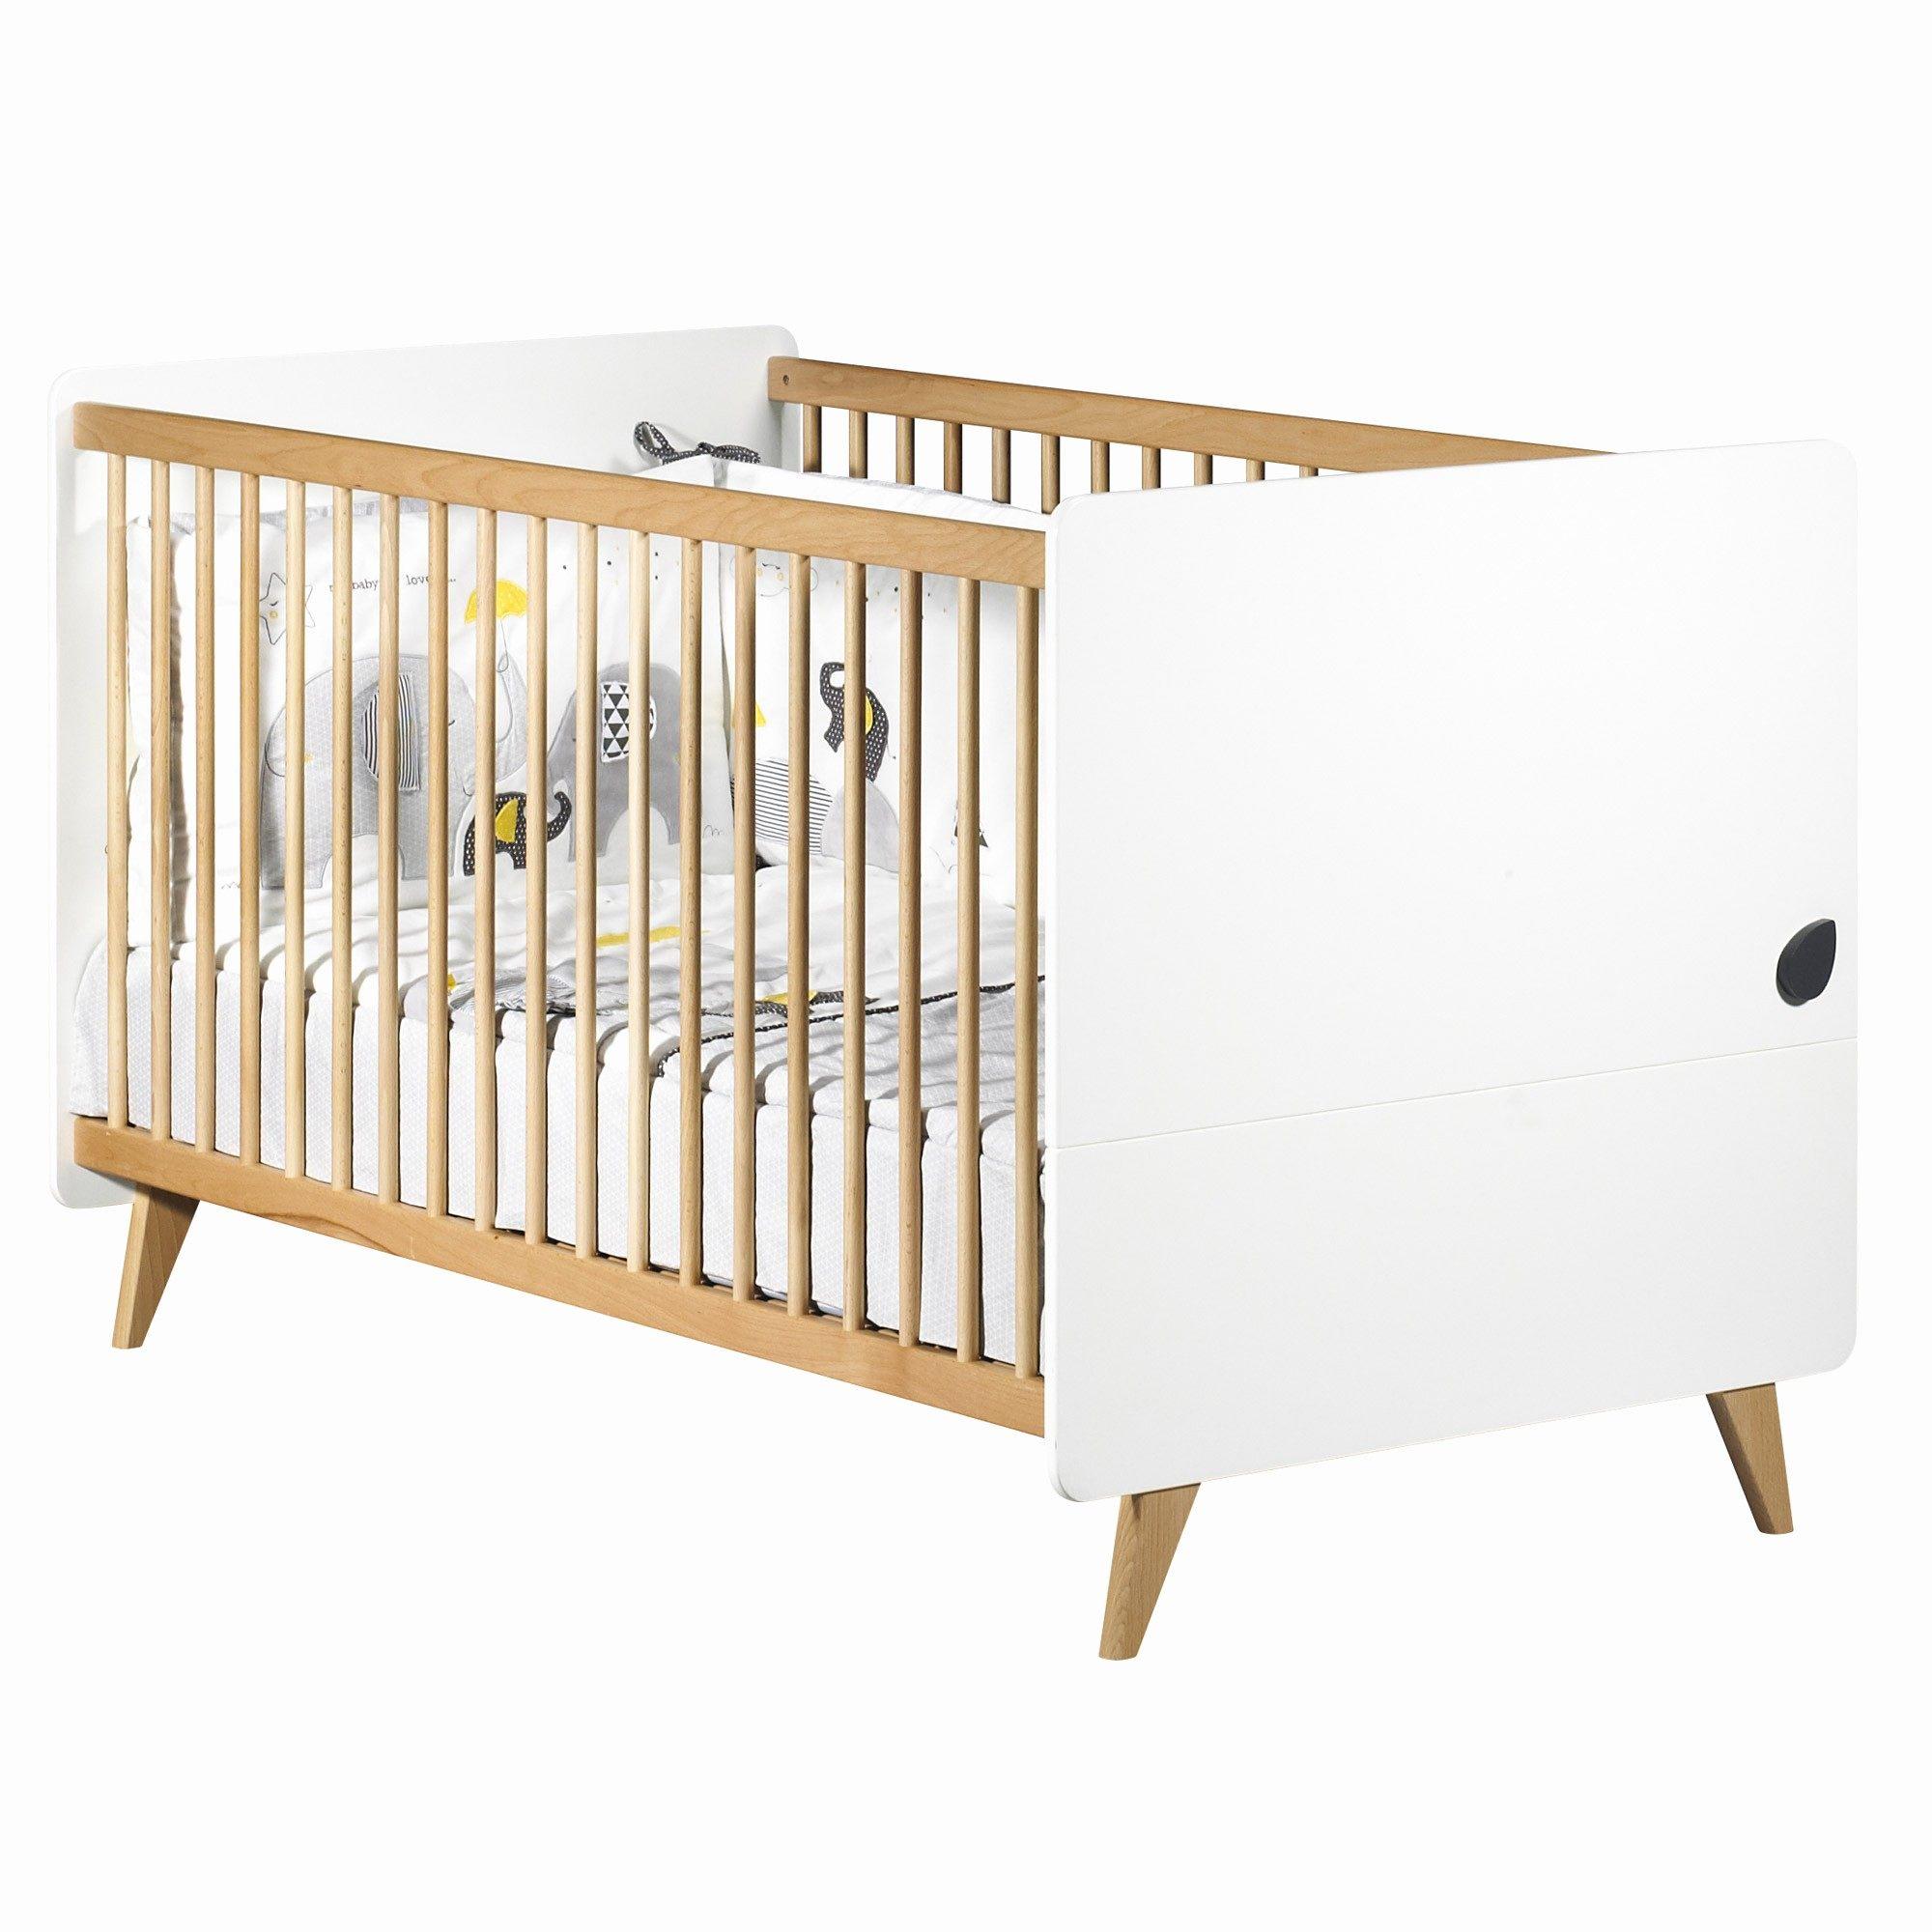 Lit Bébé Ikea Hensvik De Luxe Baignoire Pliante Bébé Beautiful Lit Bebe Luxe 36 Ikea Best De Avec